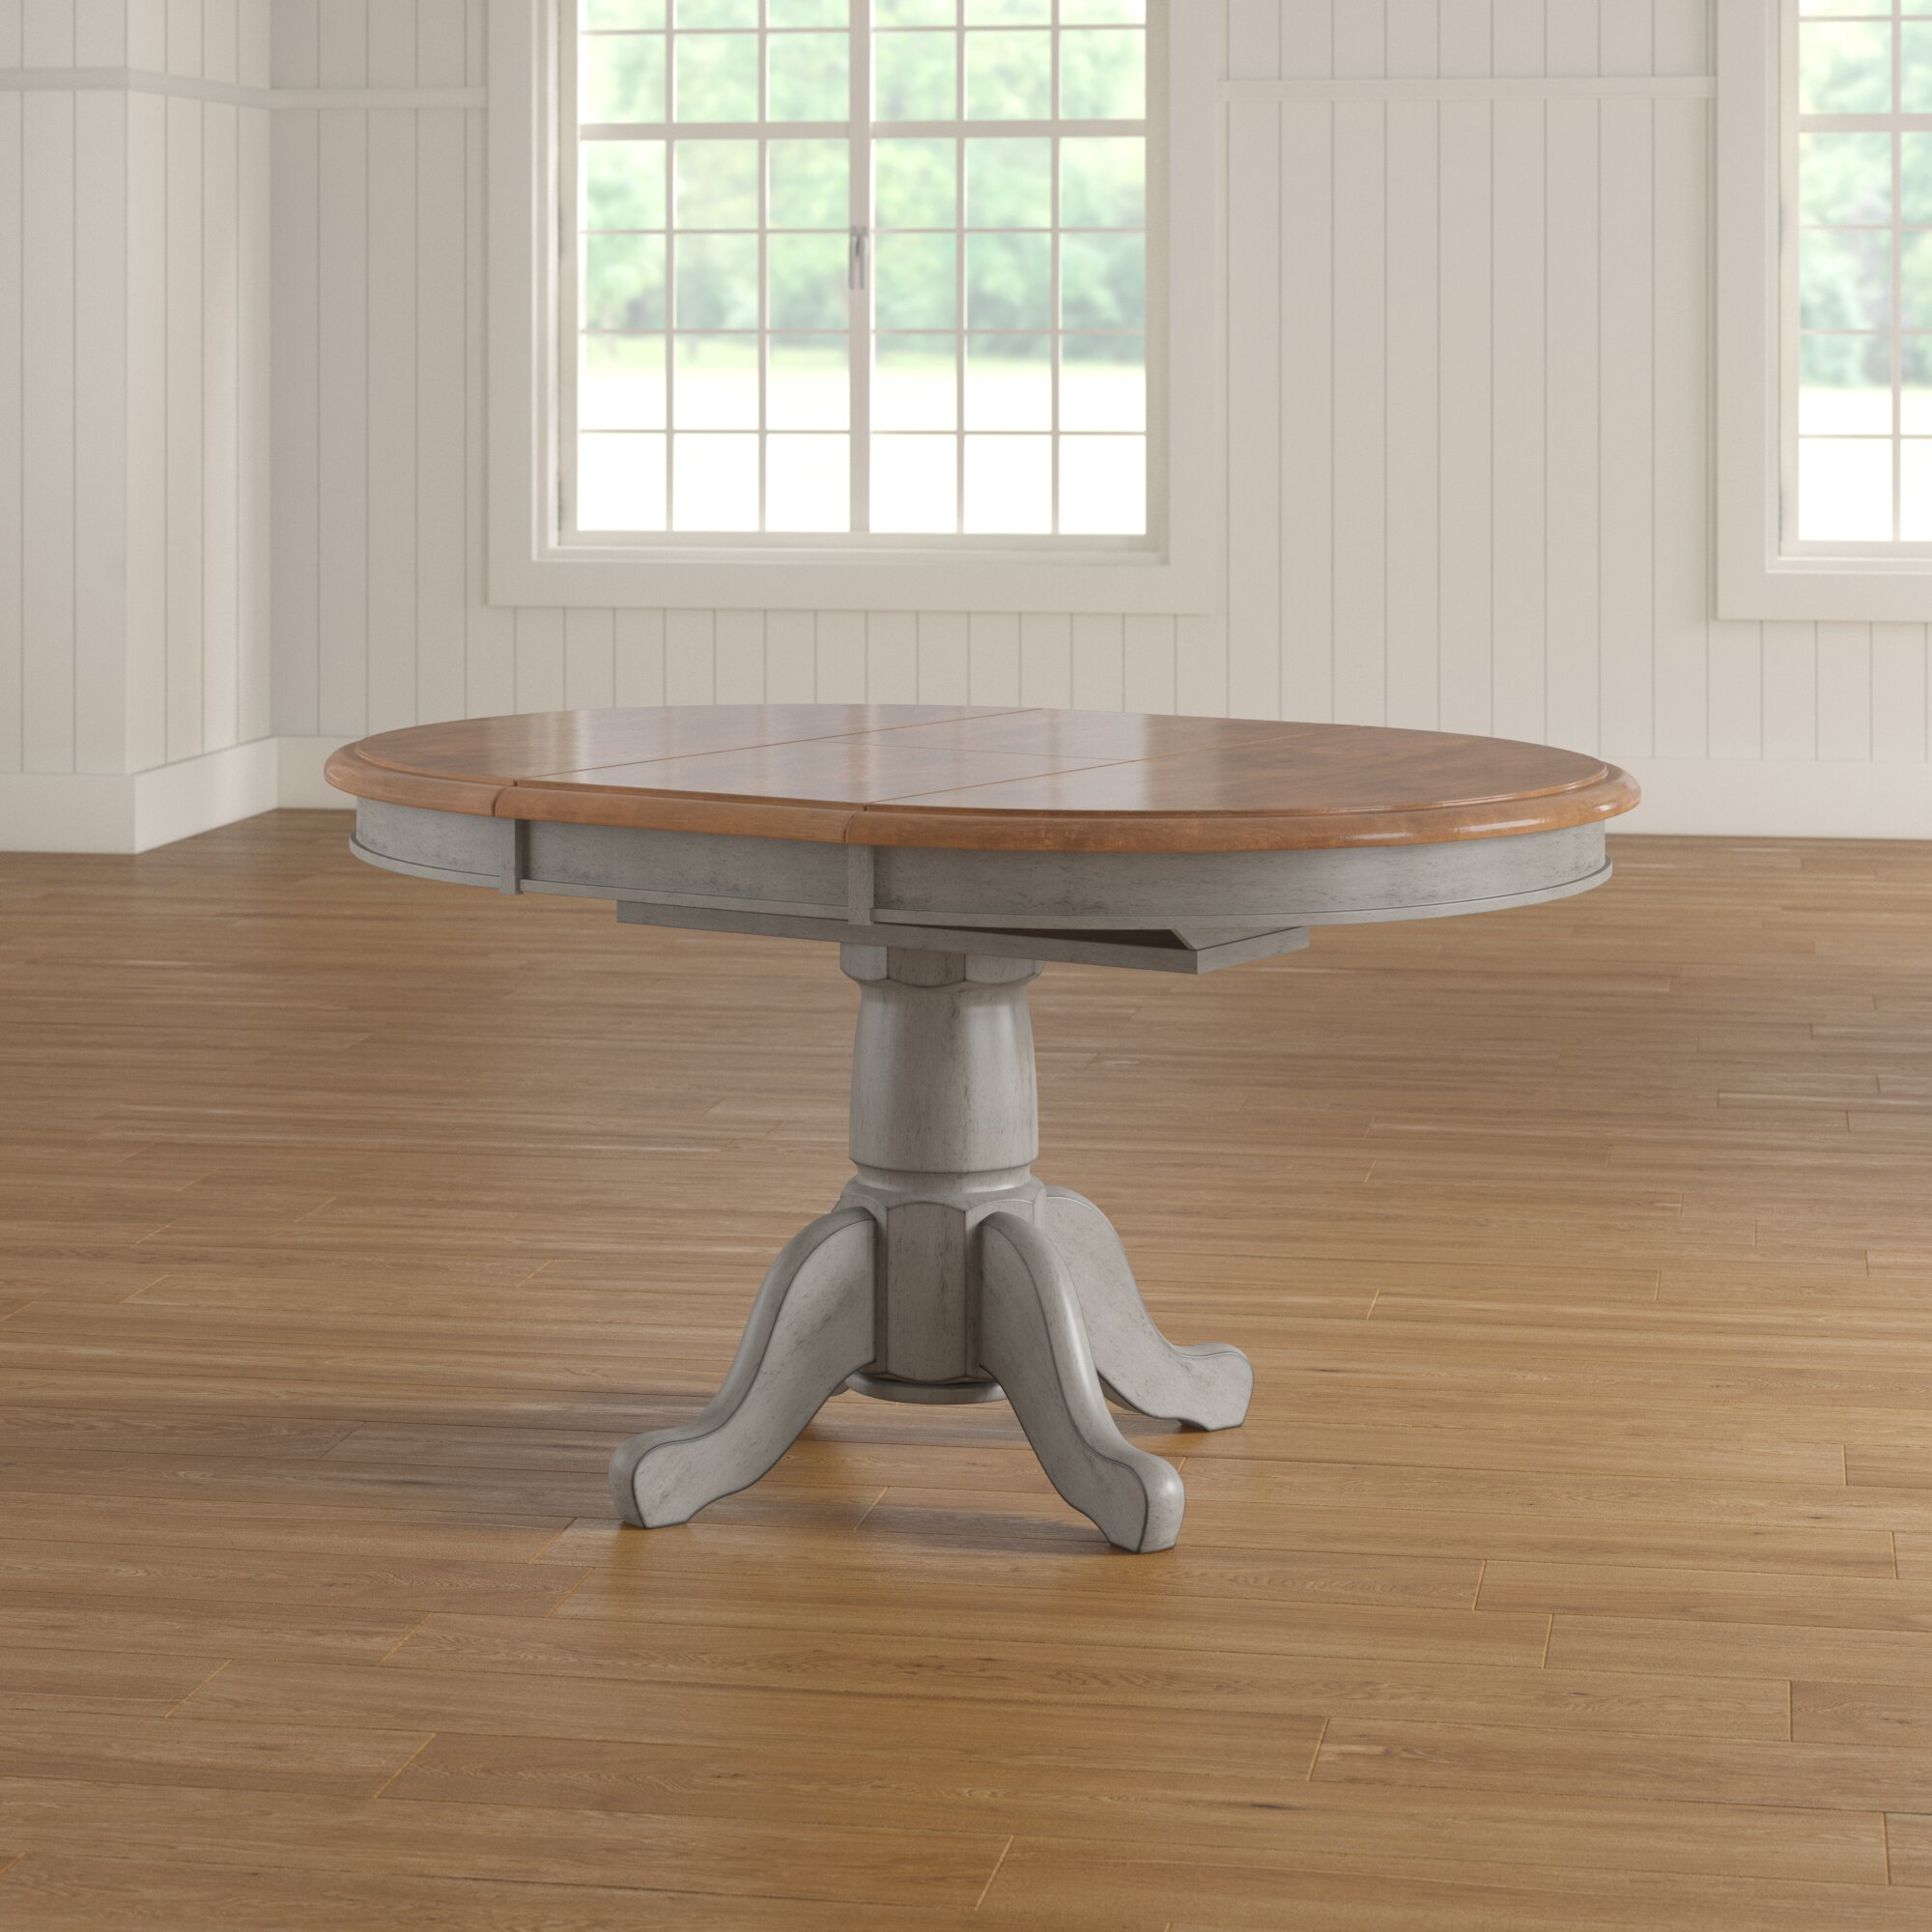 August Grove Wonderly Pedestal Extendable Dining Table Reviews Wayfair